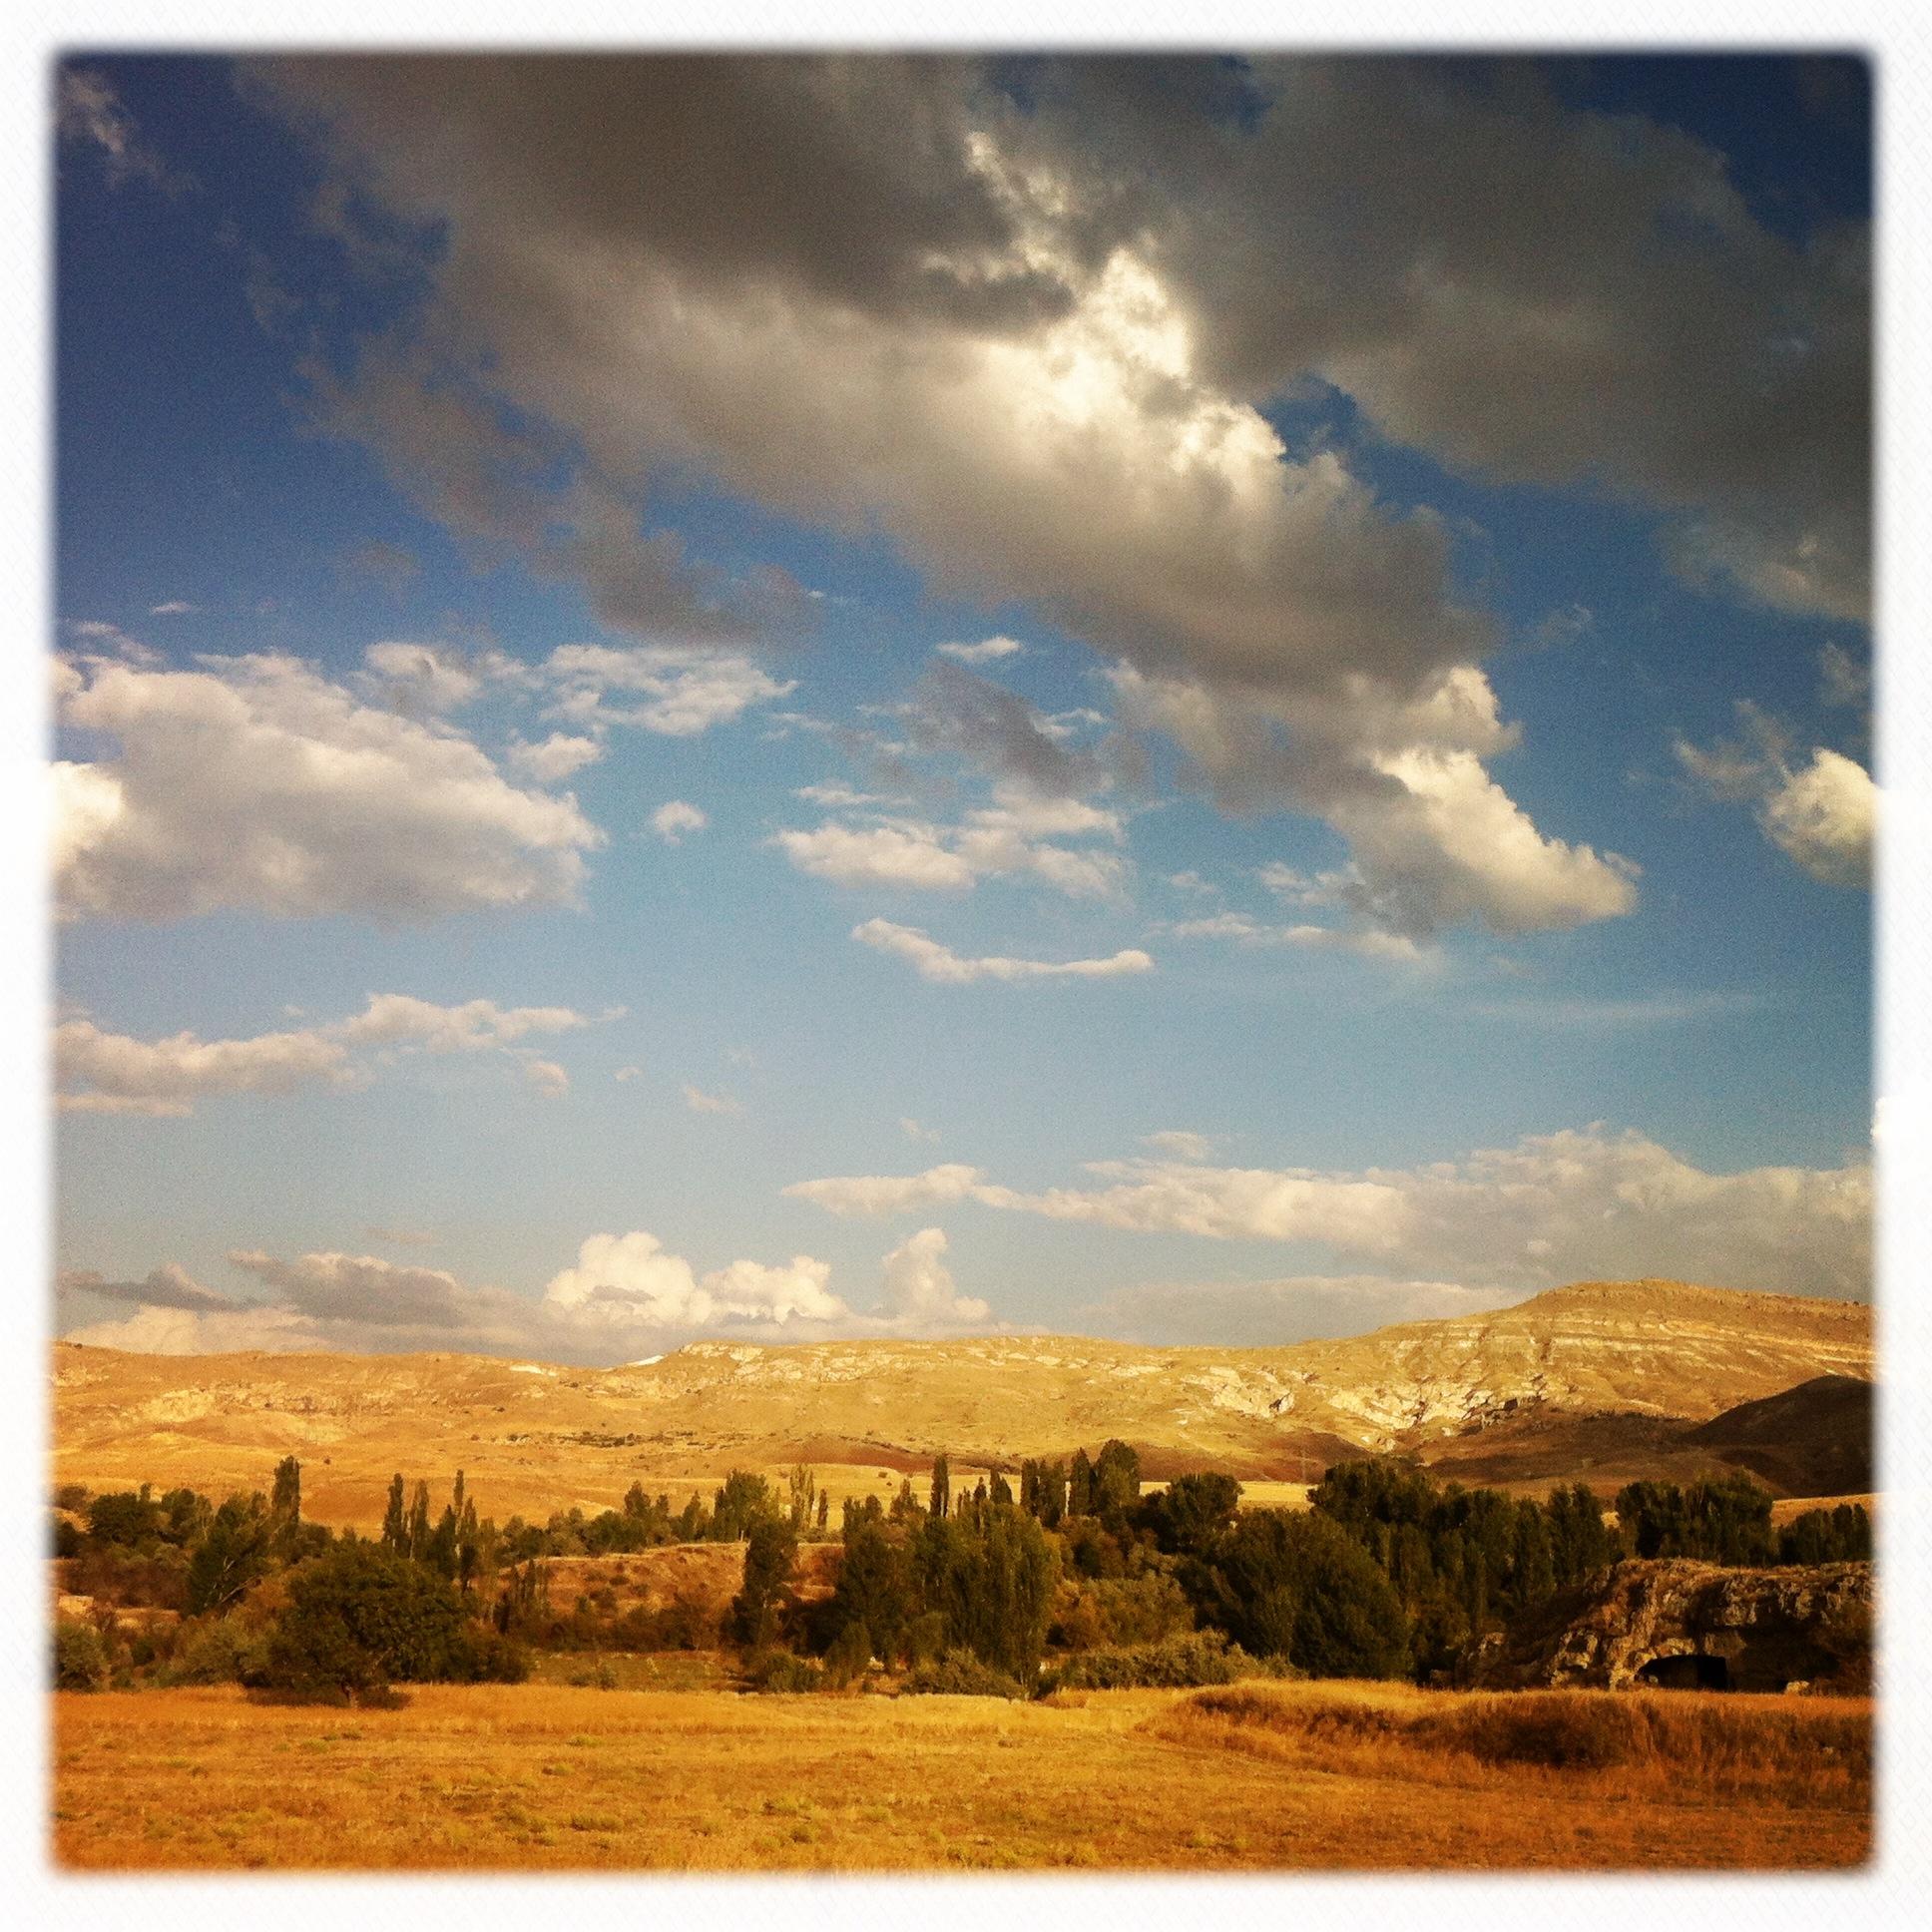 Paesaggio della Cappadocia